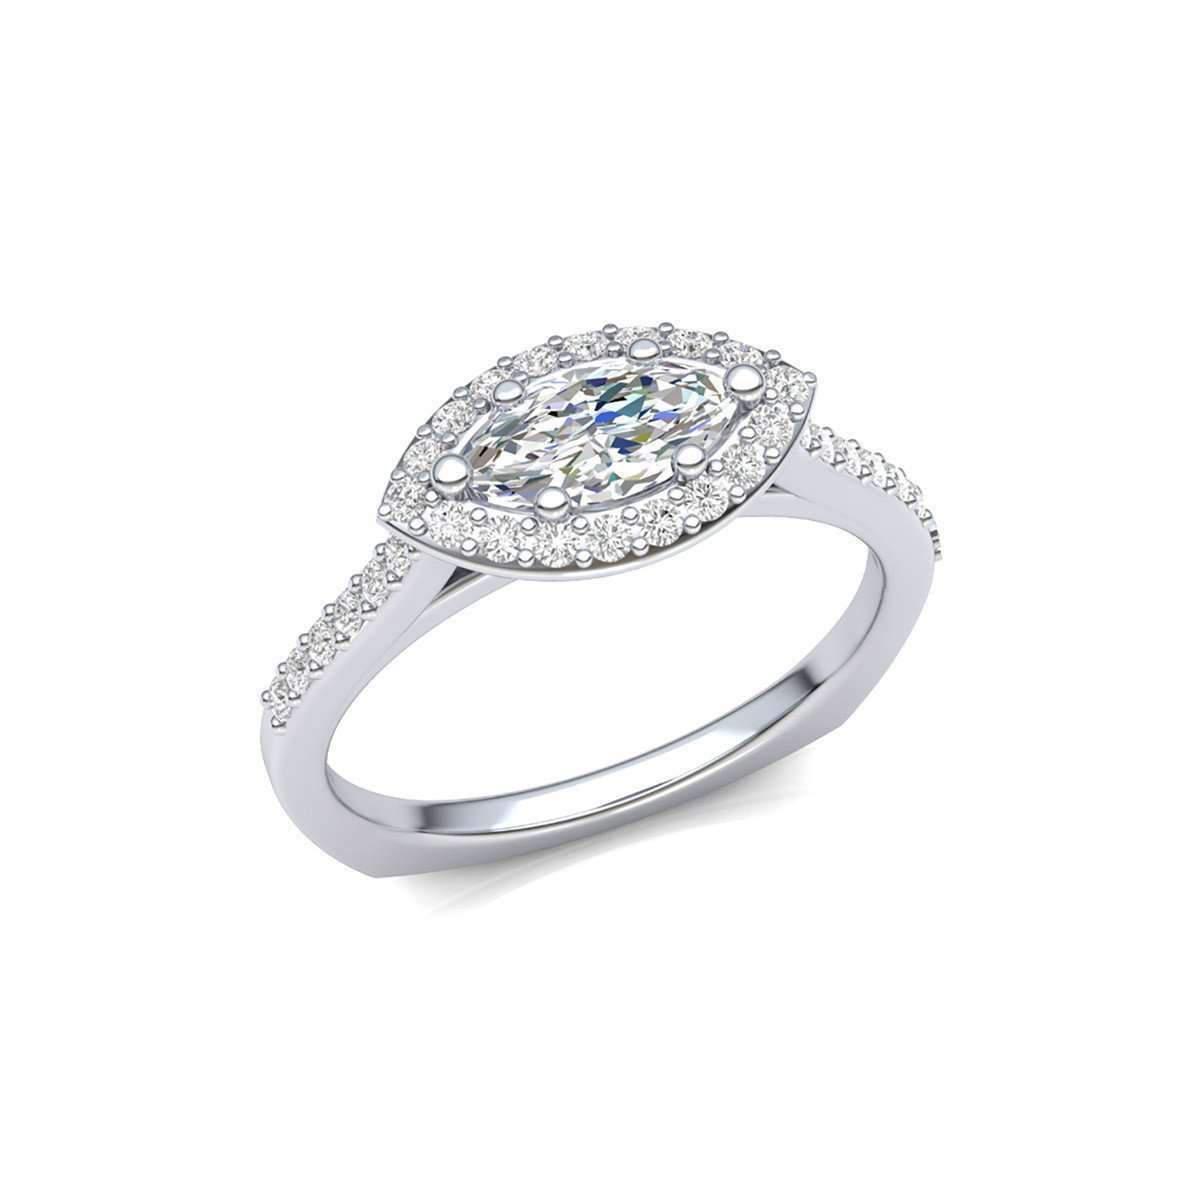 Harry Kotlar Marquise Ring - UK N - US 6 1/2 - EU 54 2bSzi